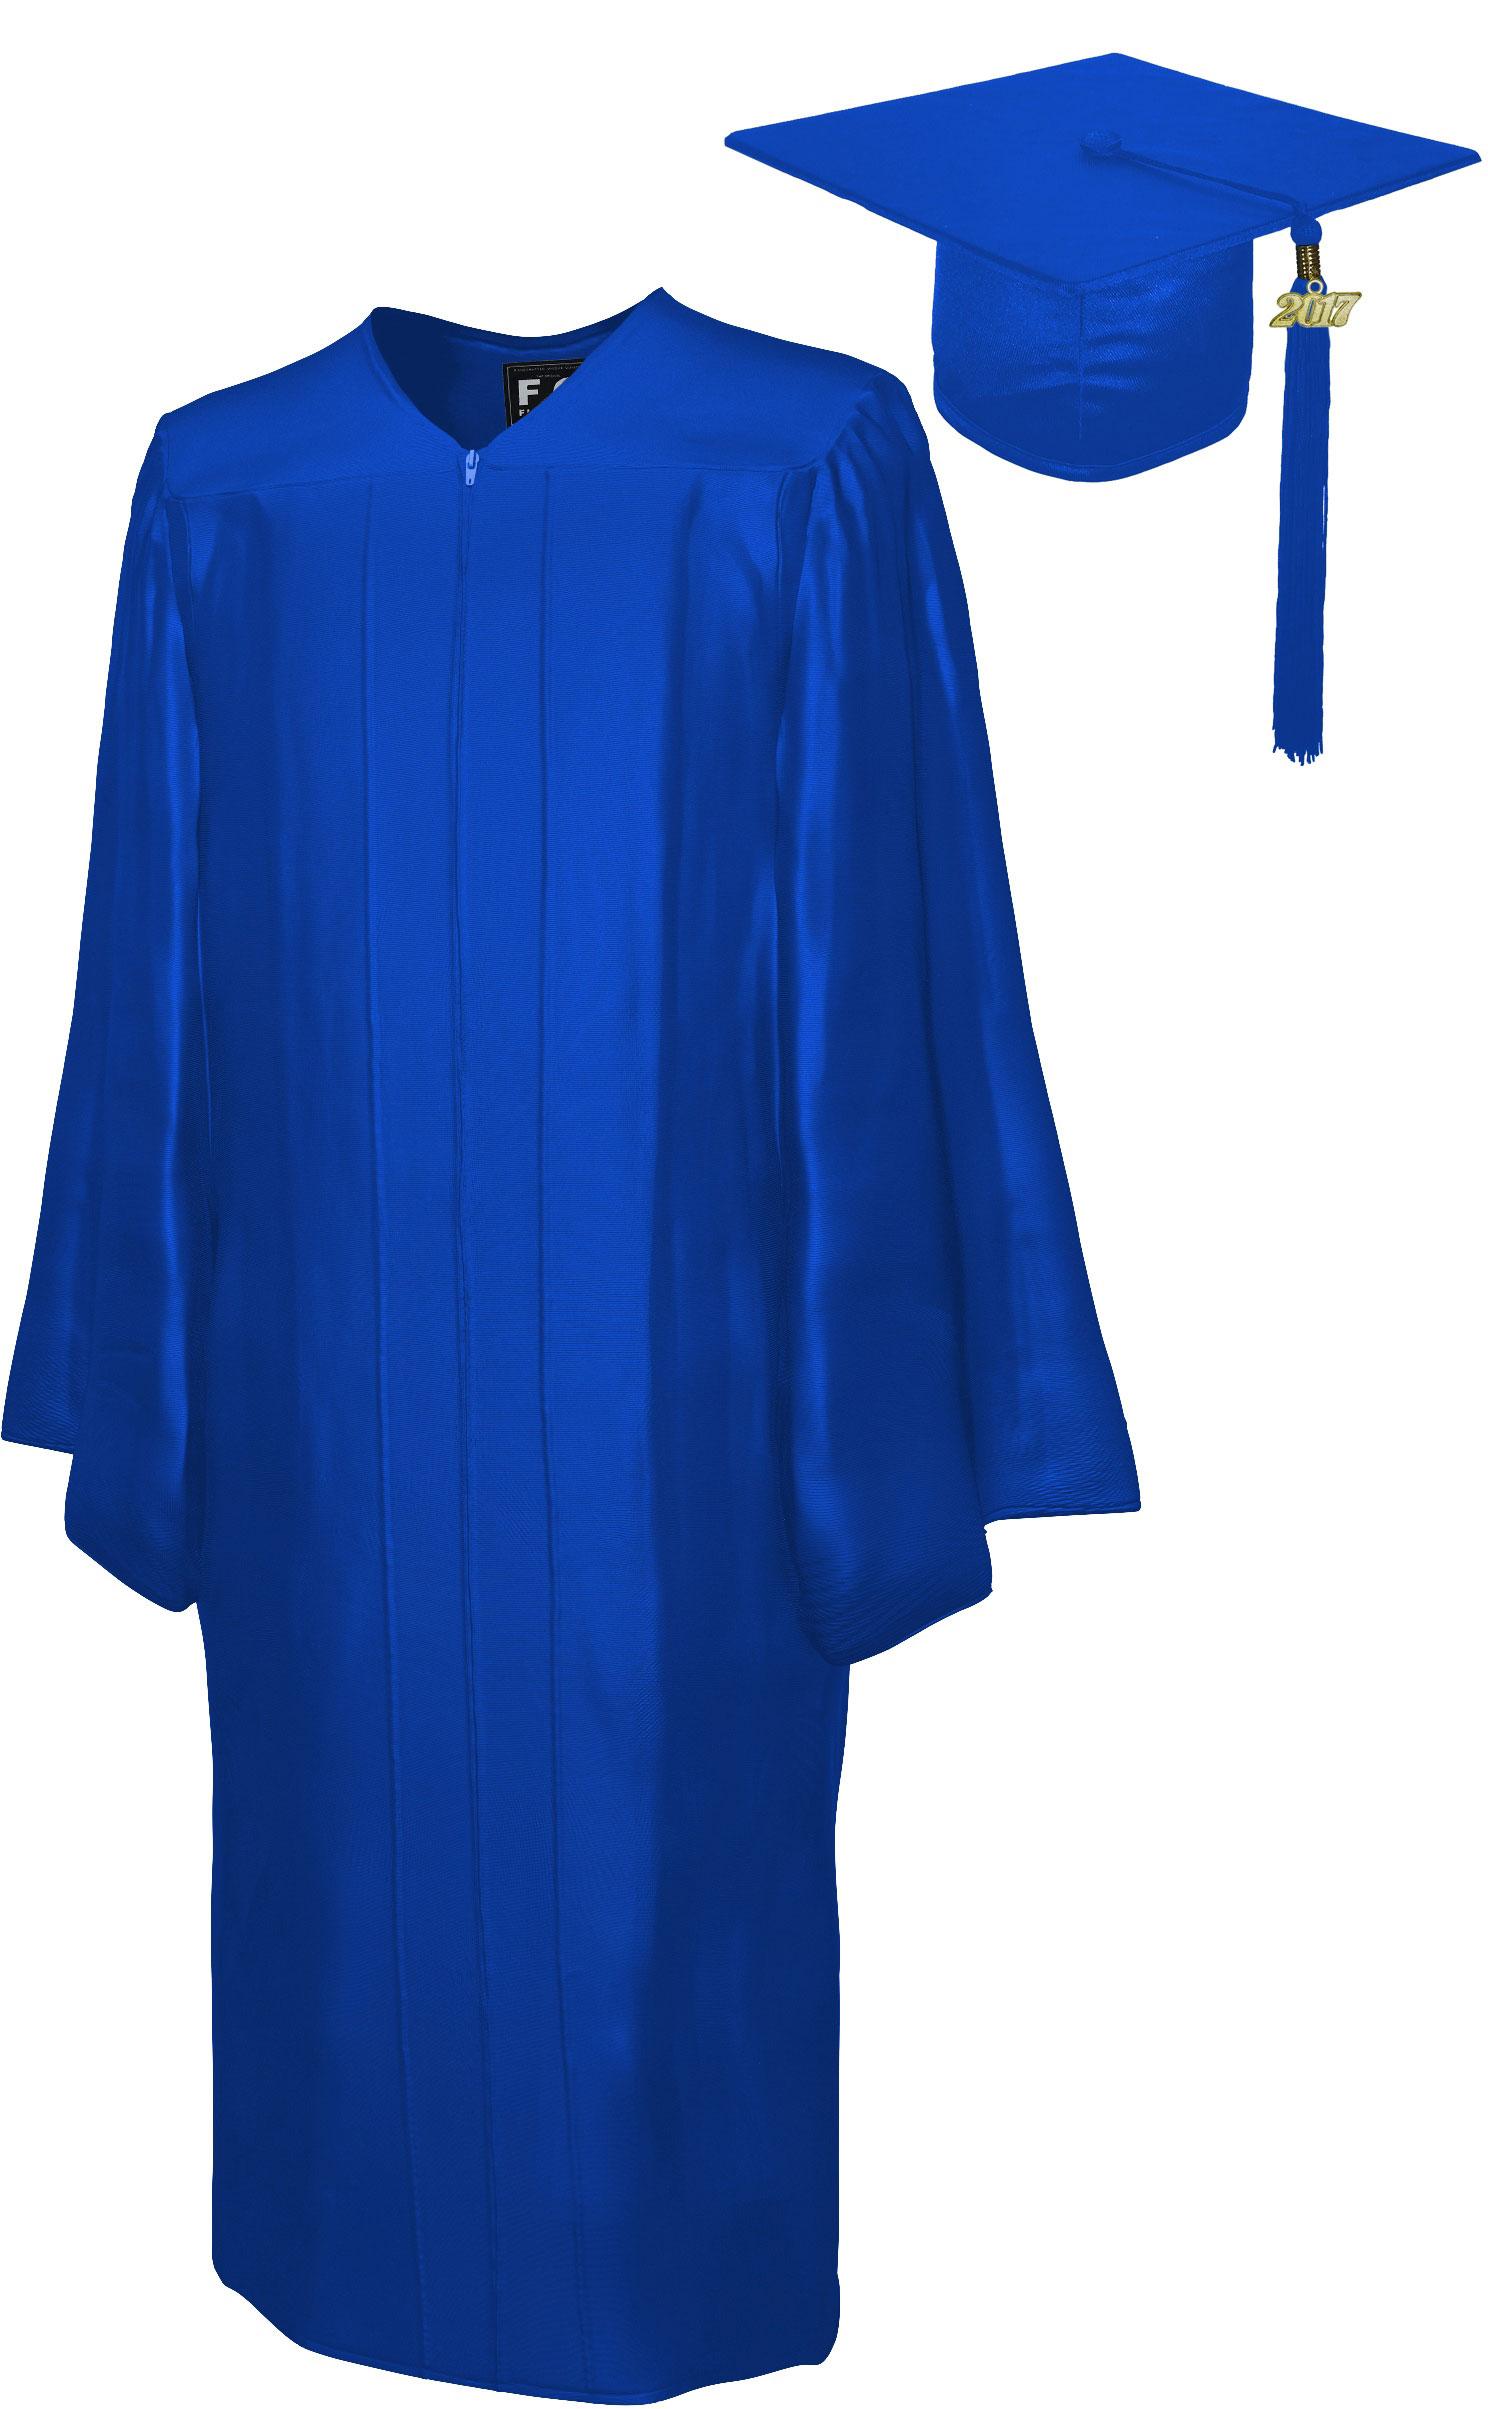 Shiny Royal Blue Cap Amp Gown High School Graduation Cap